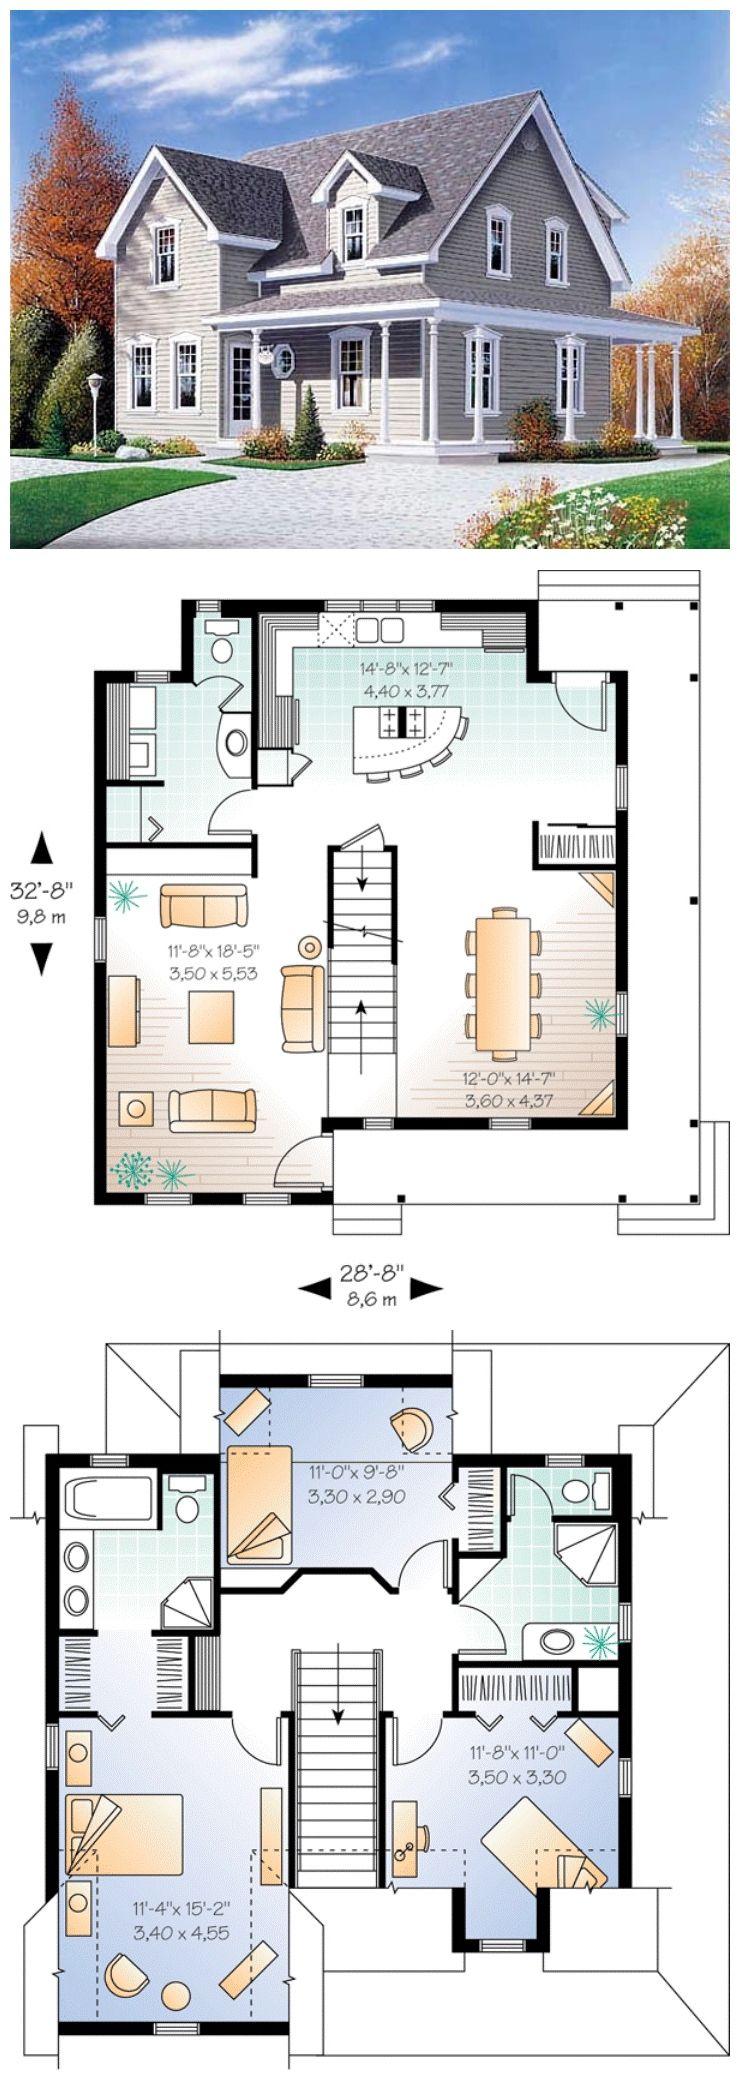 6 x 9 badezimmer design farmhouse plan u house plan   plantas arquitectónicas